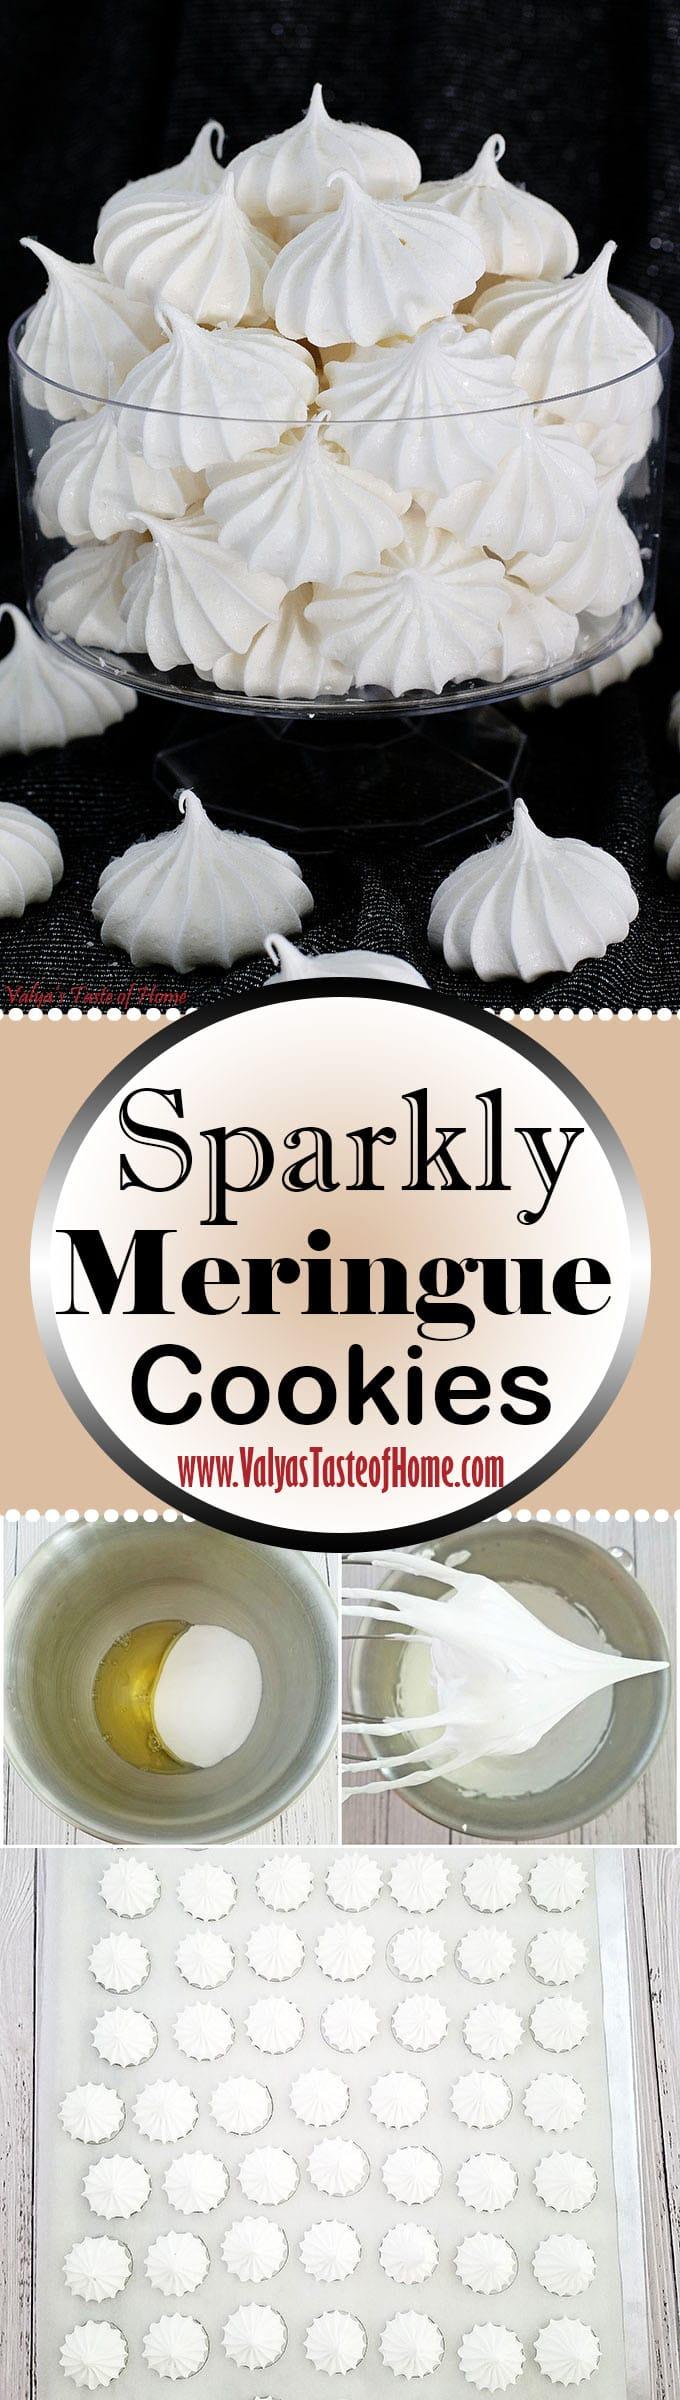 Sparkly Meringue Cookies, beautiful holiday dessert, cookies, delicious cookies, edible glitter, holiday baking, kids aproved, kids love it, meringue, Sparkly Meringue Cookies, super easy to make